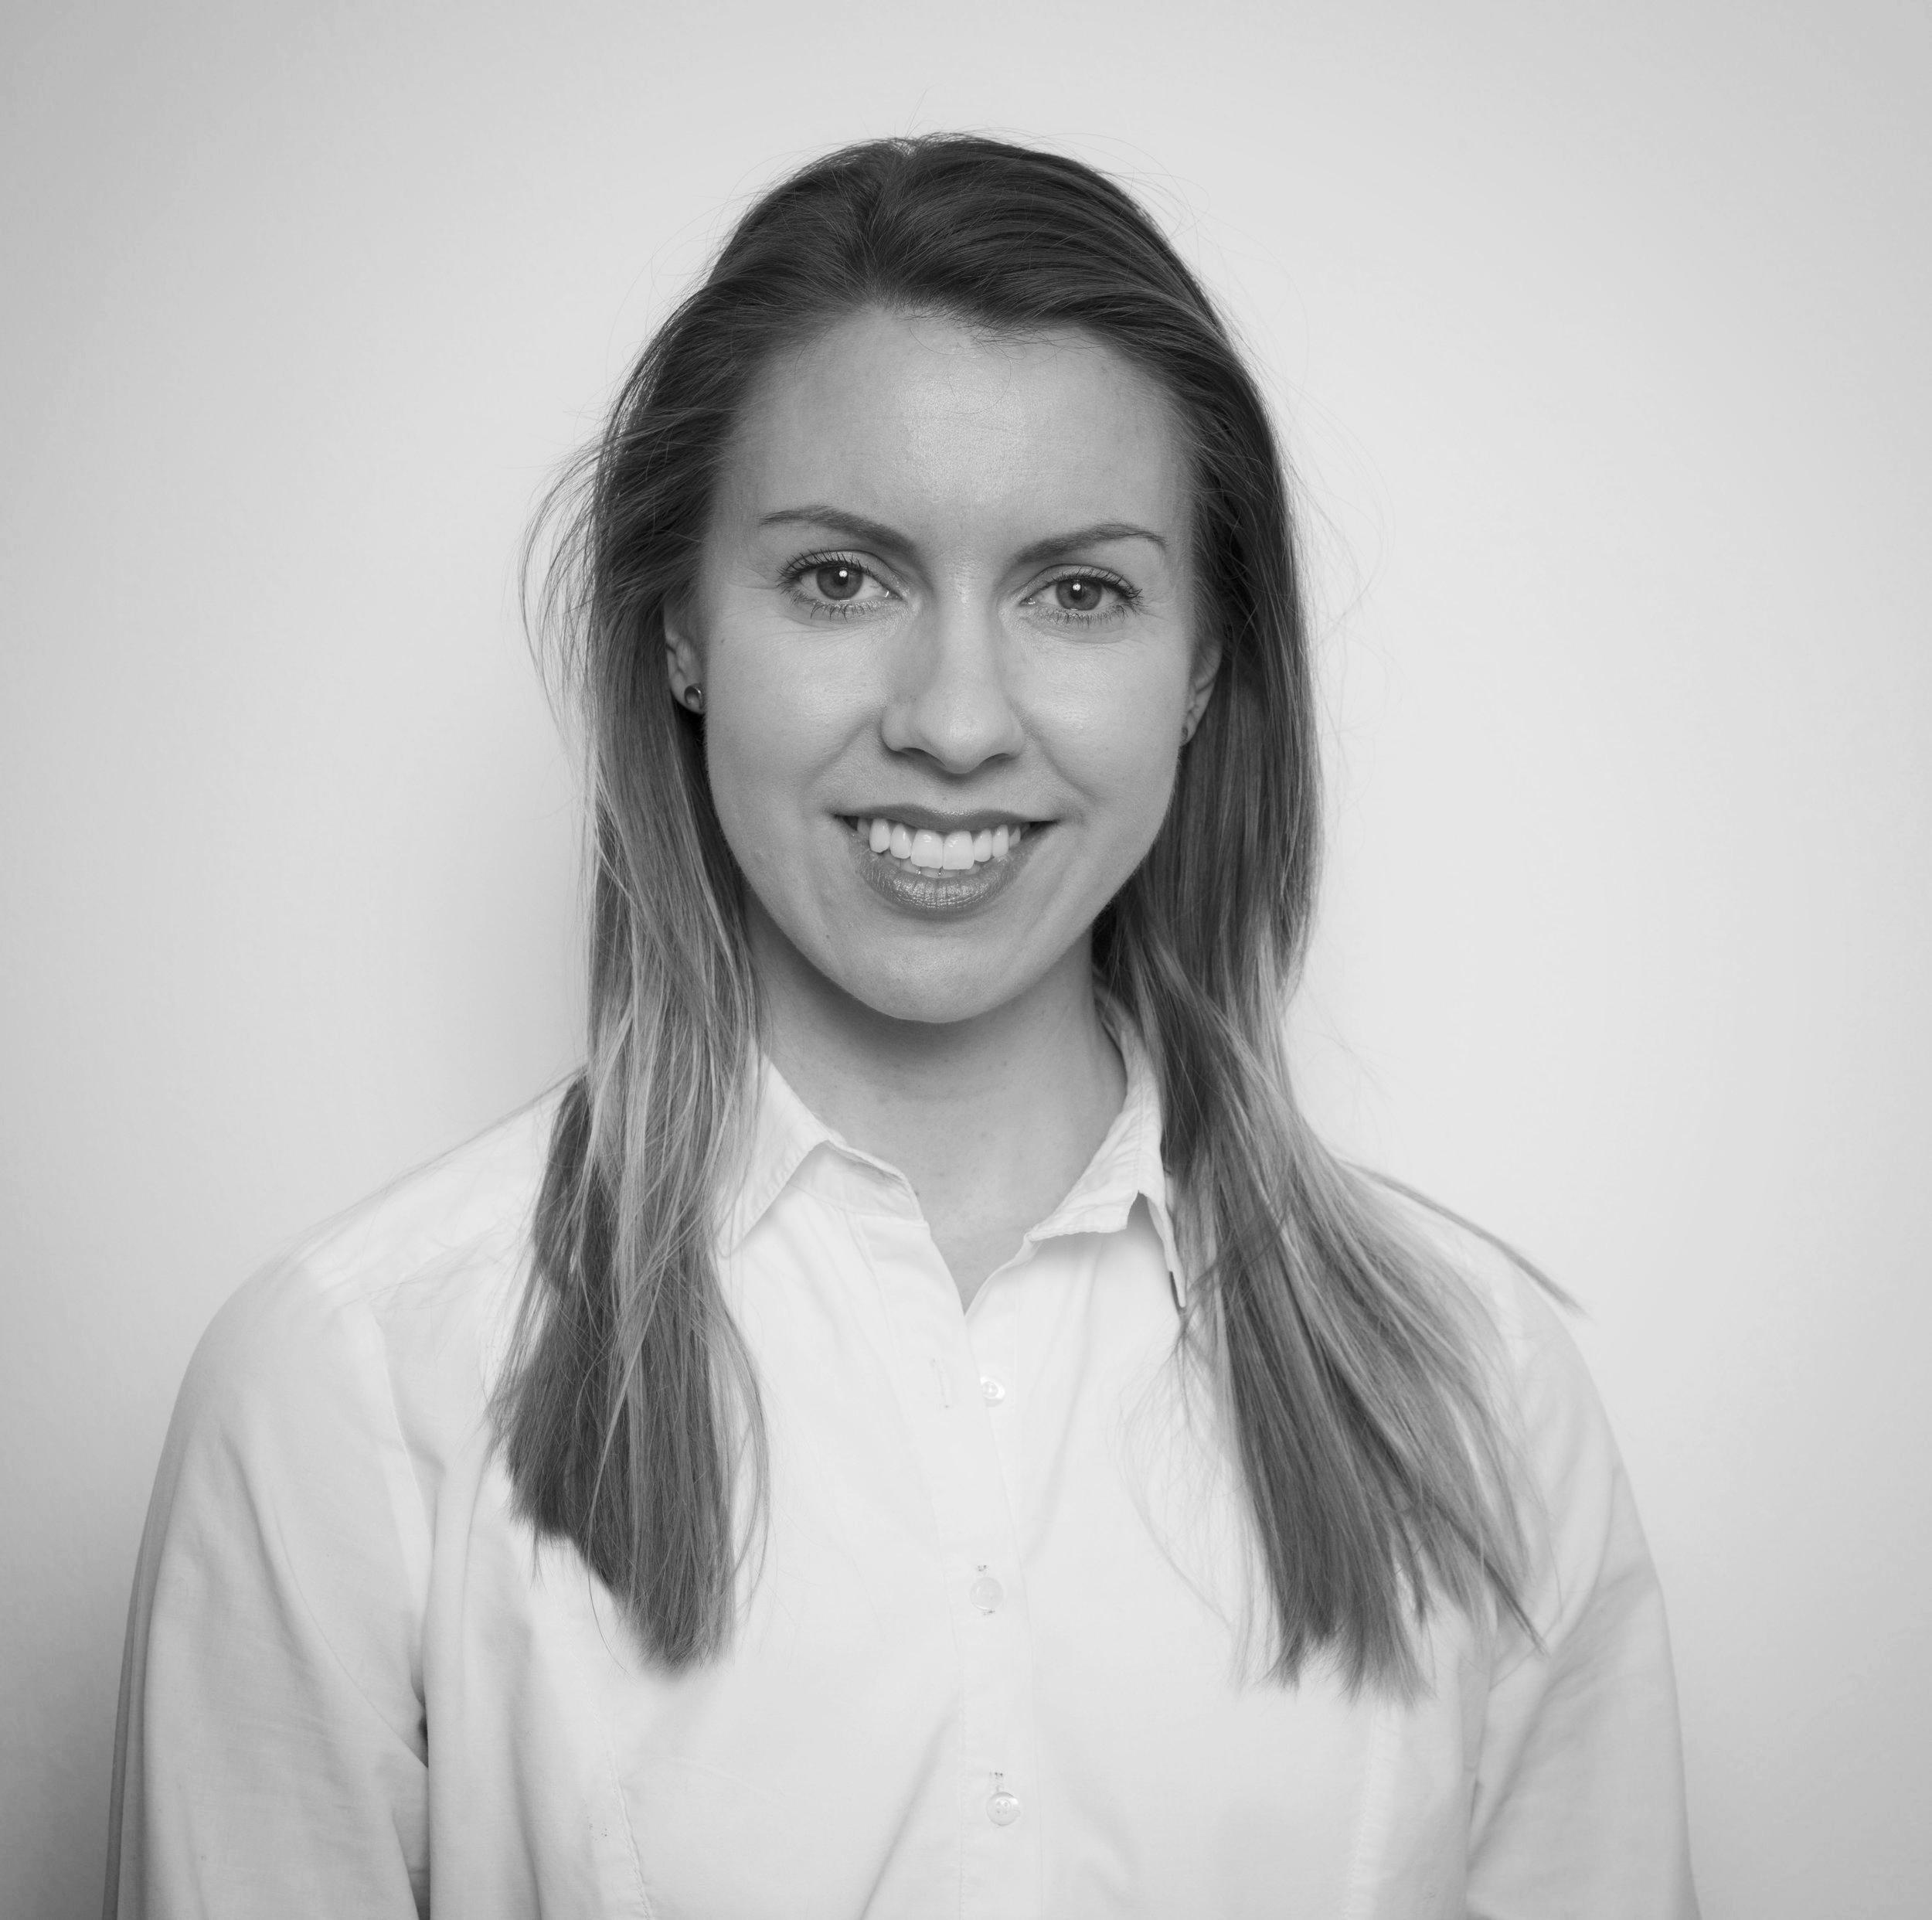 <b>Emma Sundin</b><br>Senior Account Manager, Lifestyle